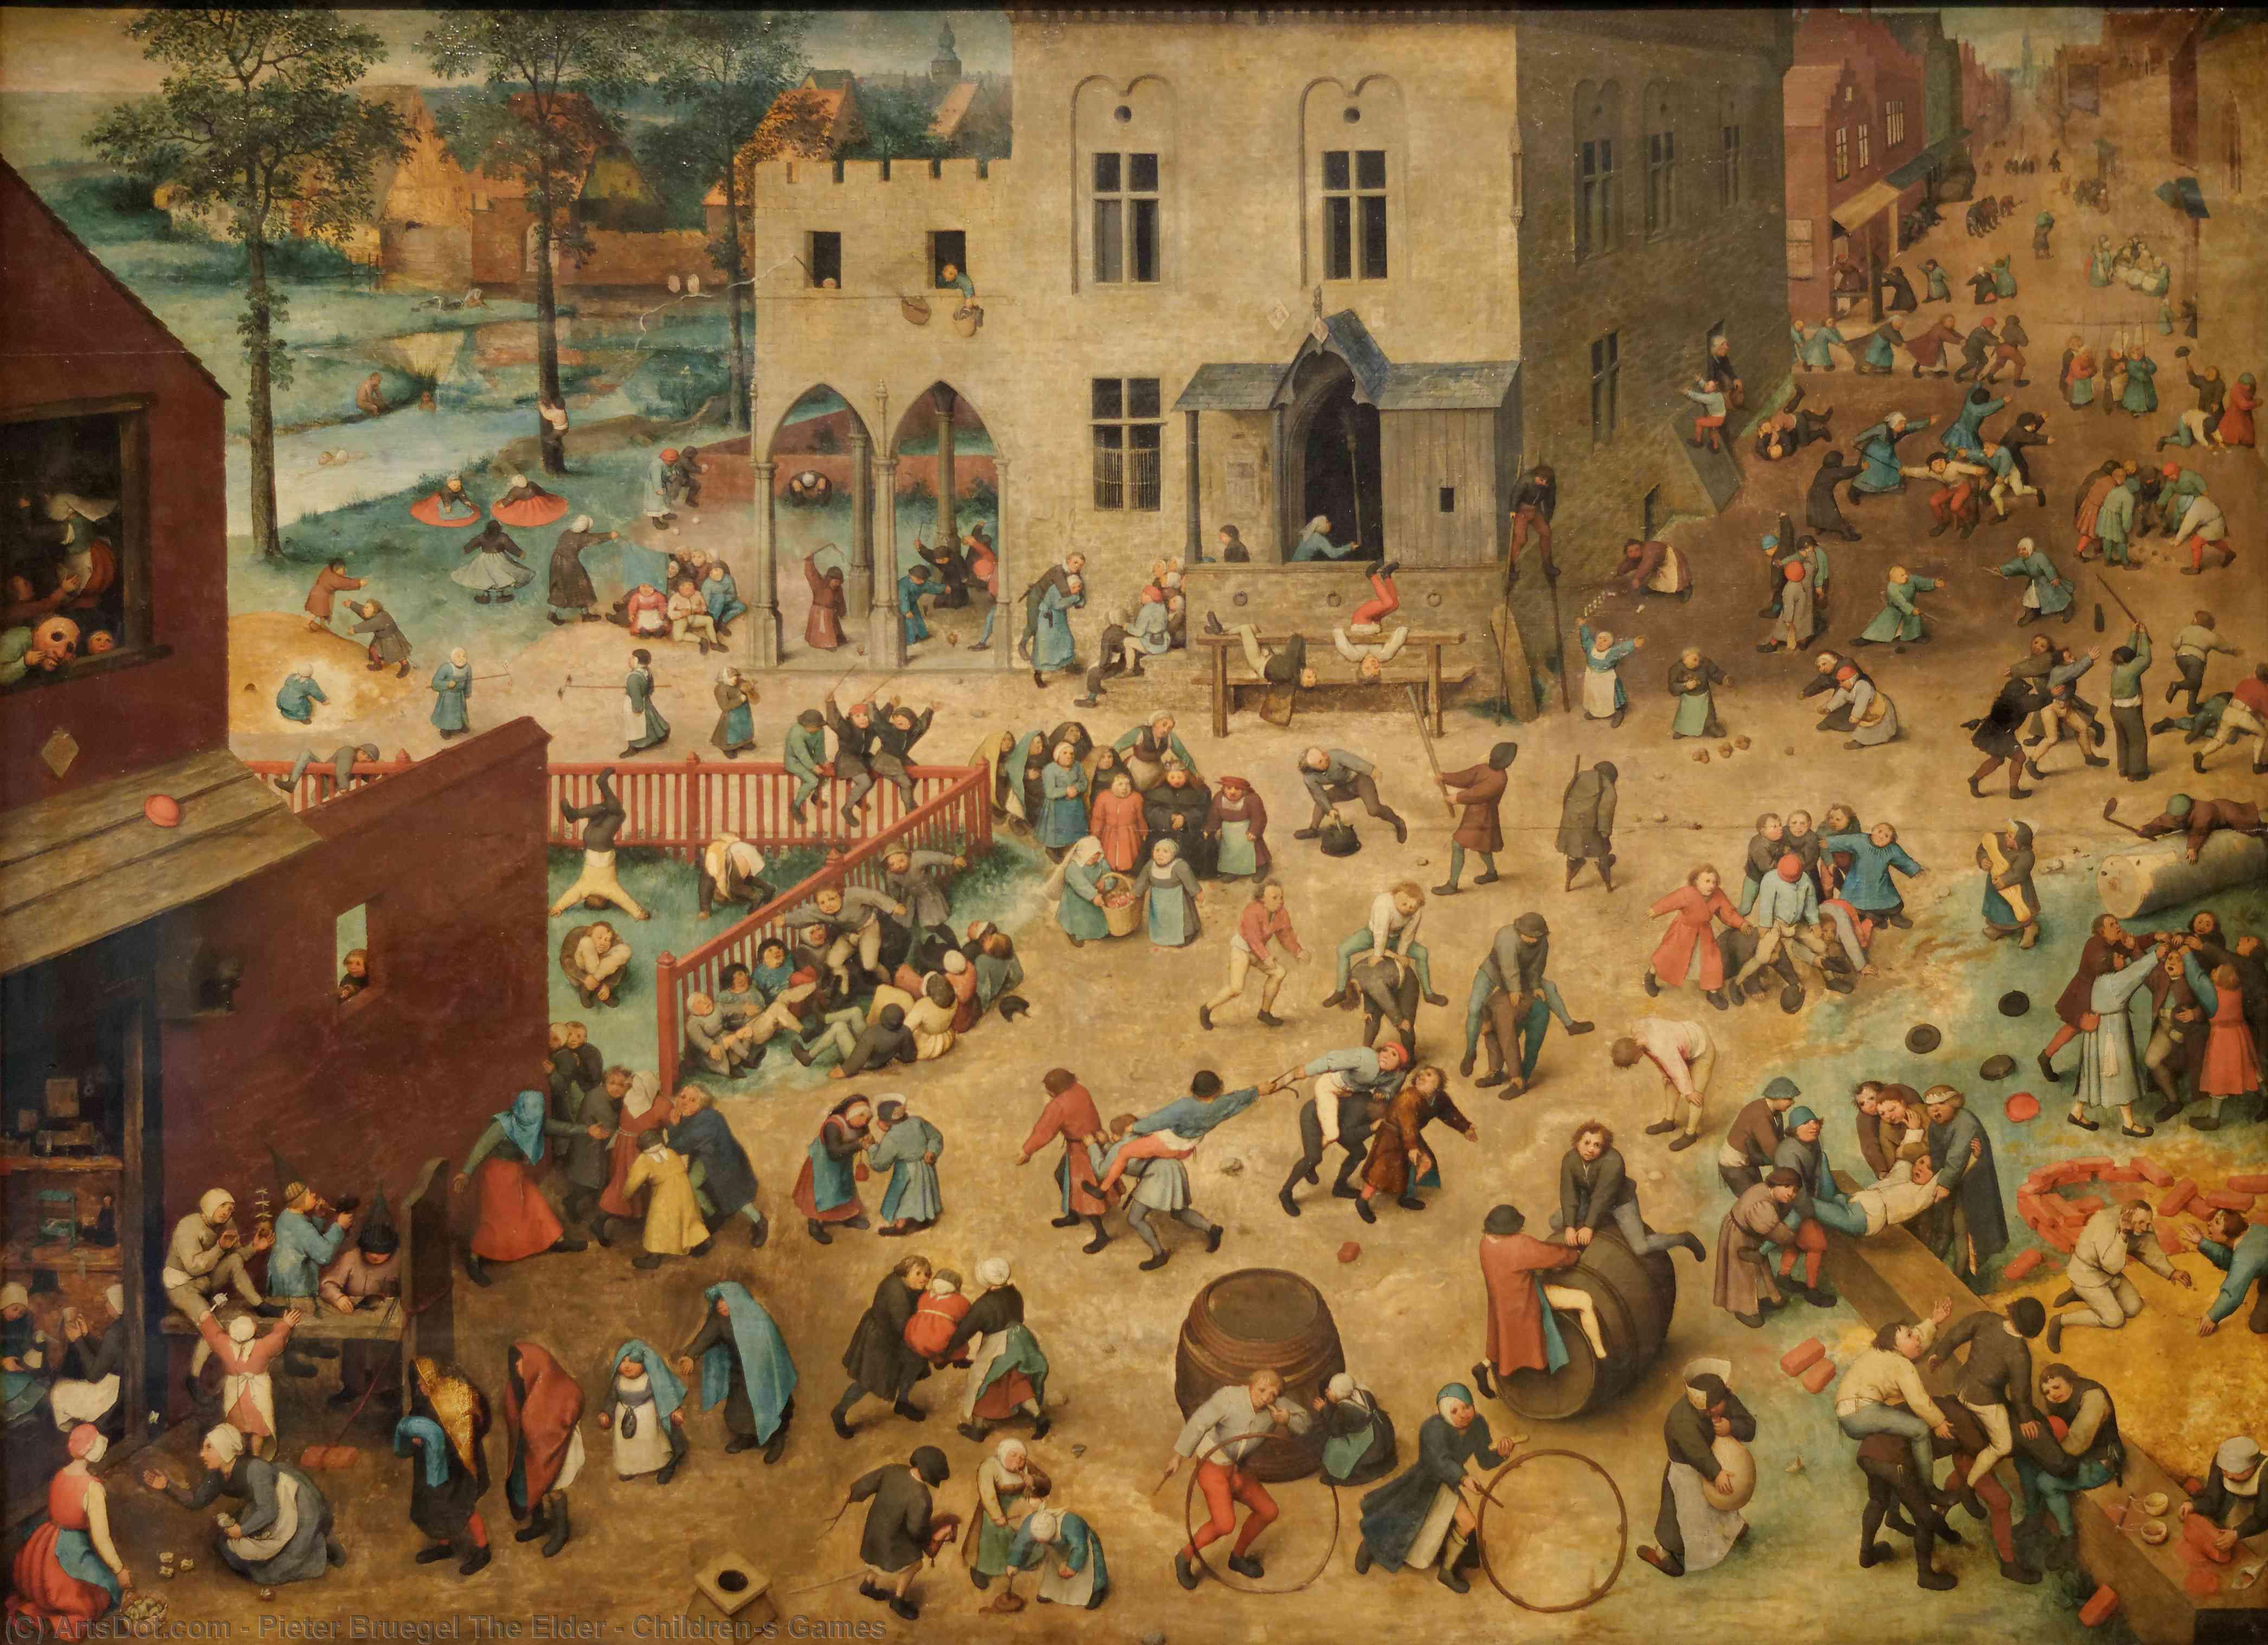 Wikioo.org - The Encyclopedia of Fine Arts - Painting, Artwork by Pieter Bruegel The Elder - Children's Games